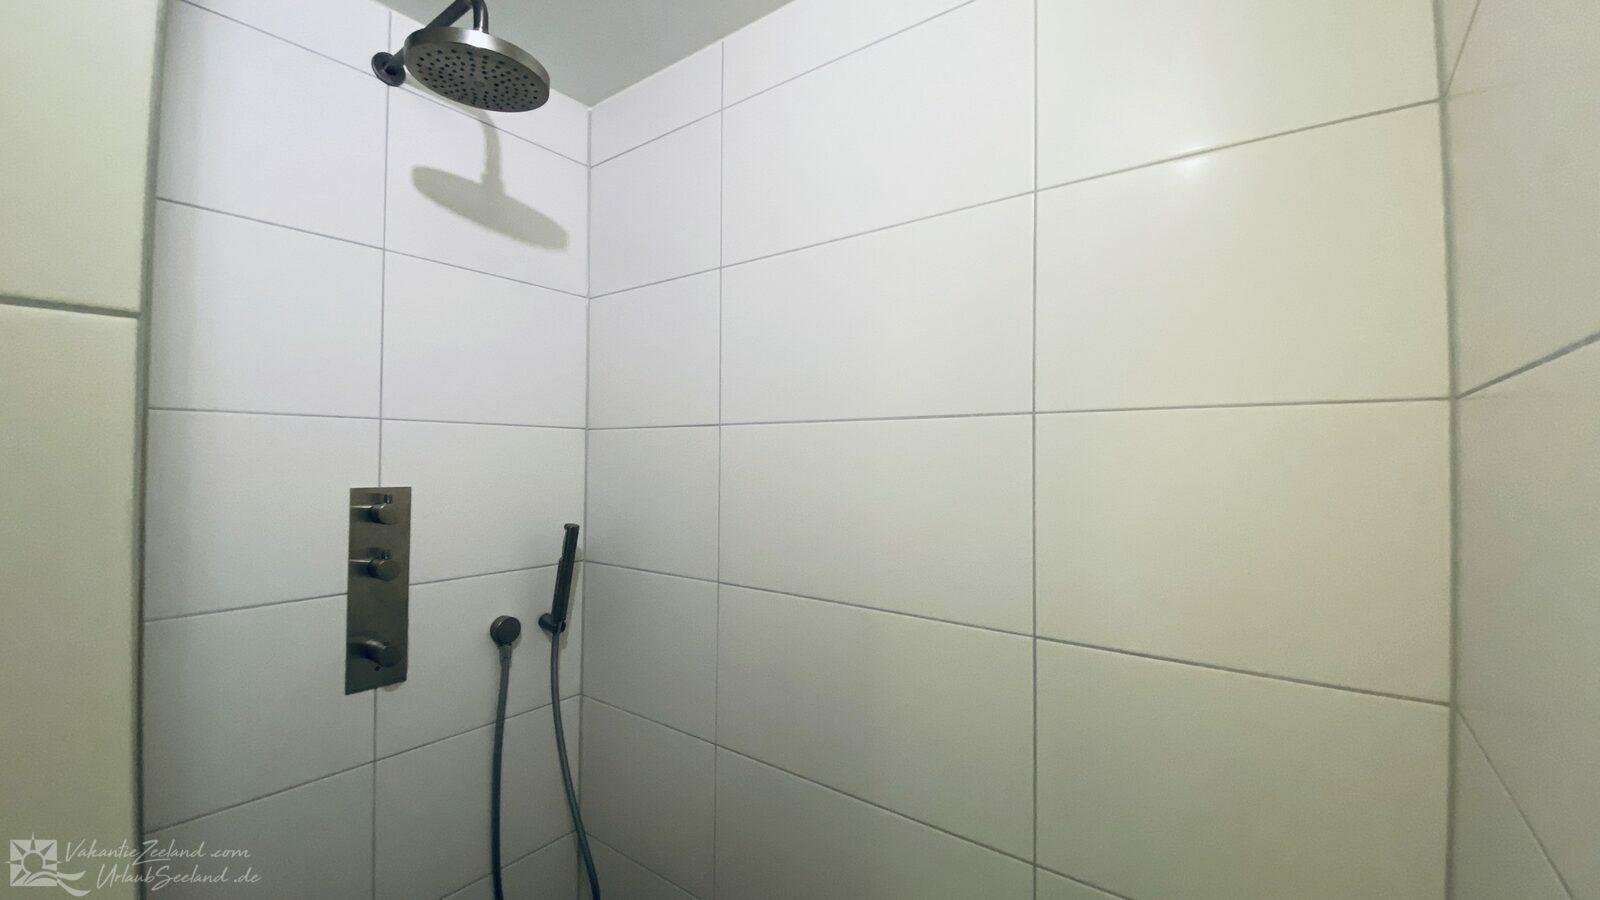 VZ799 Watervilla Super VIP Ouddorp